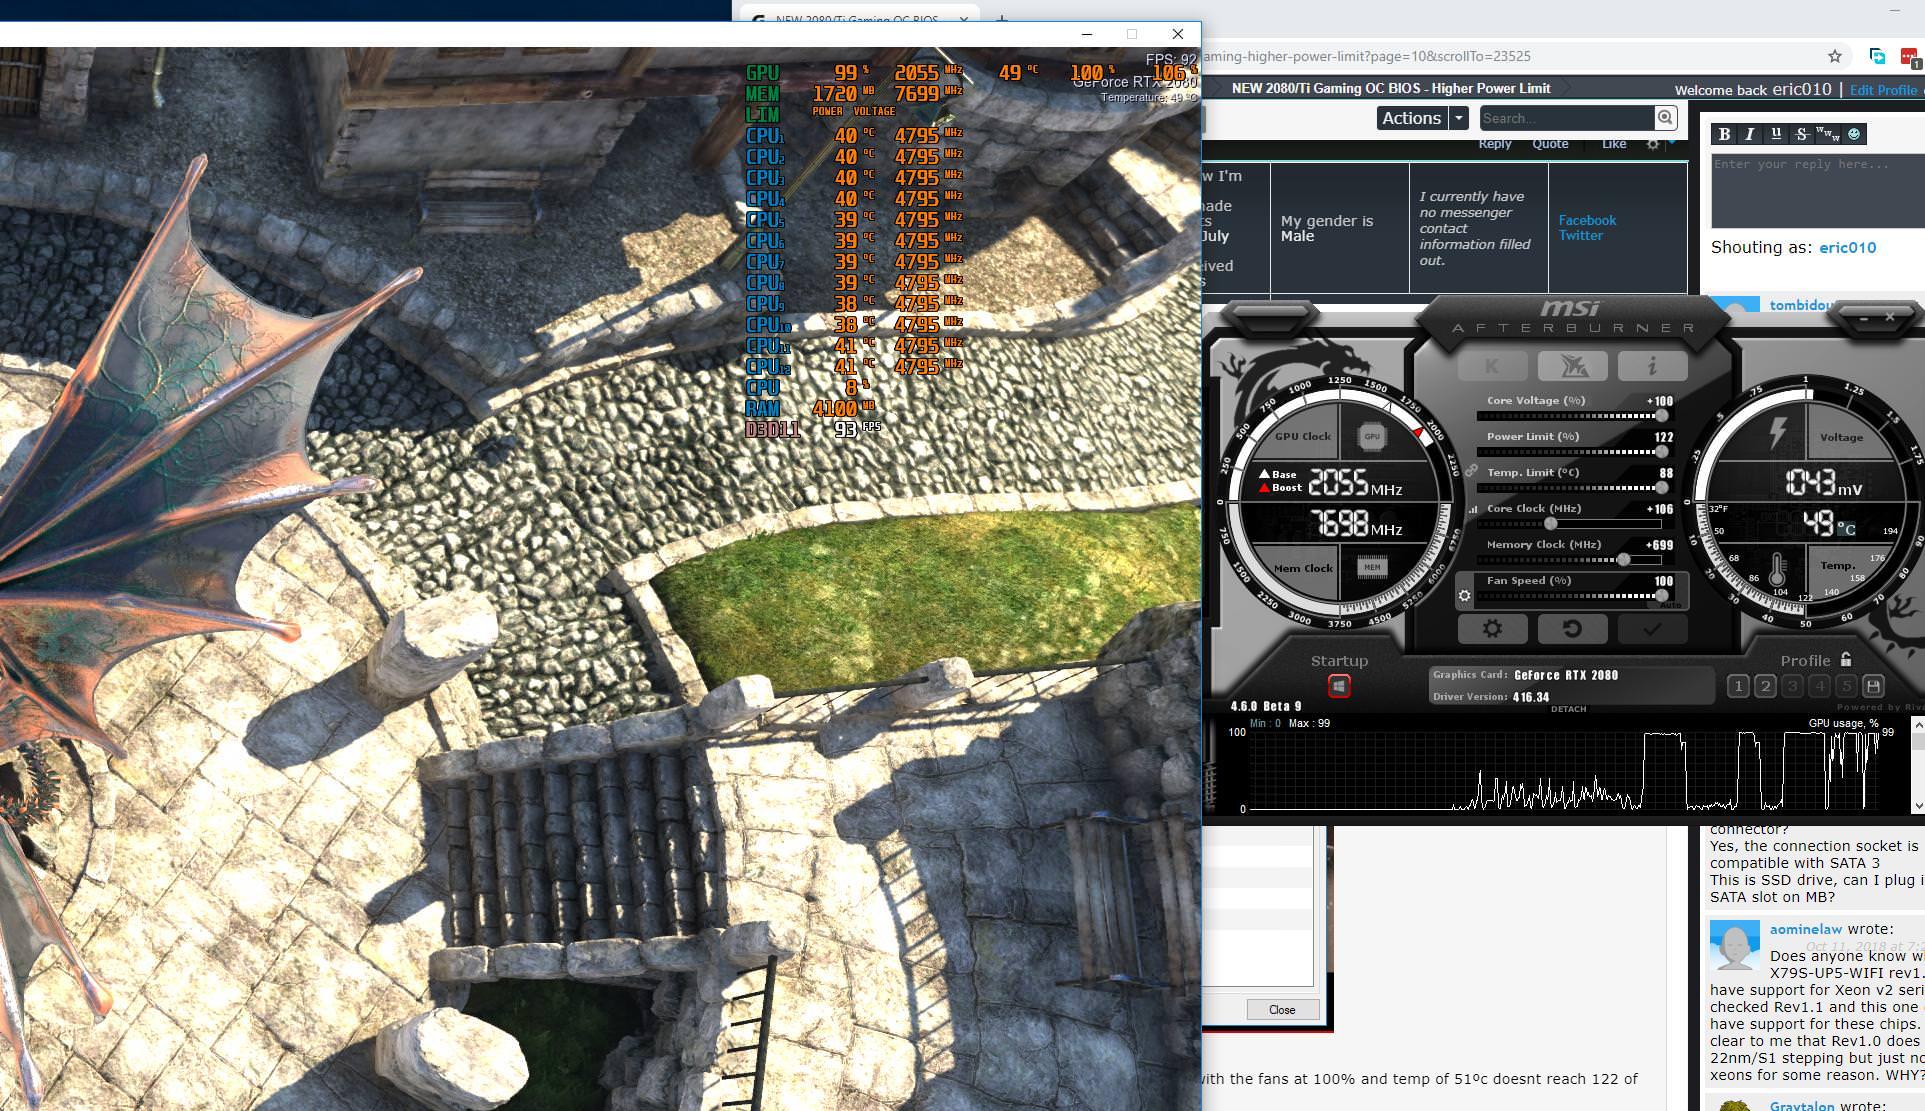 La Gigabyte RTX 2080 Ti Gaming OC recibe una nueva BIOS que